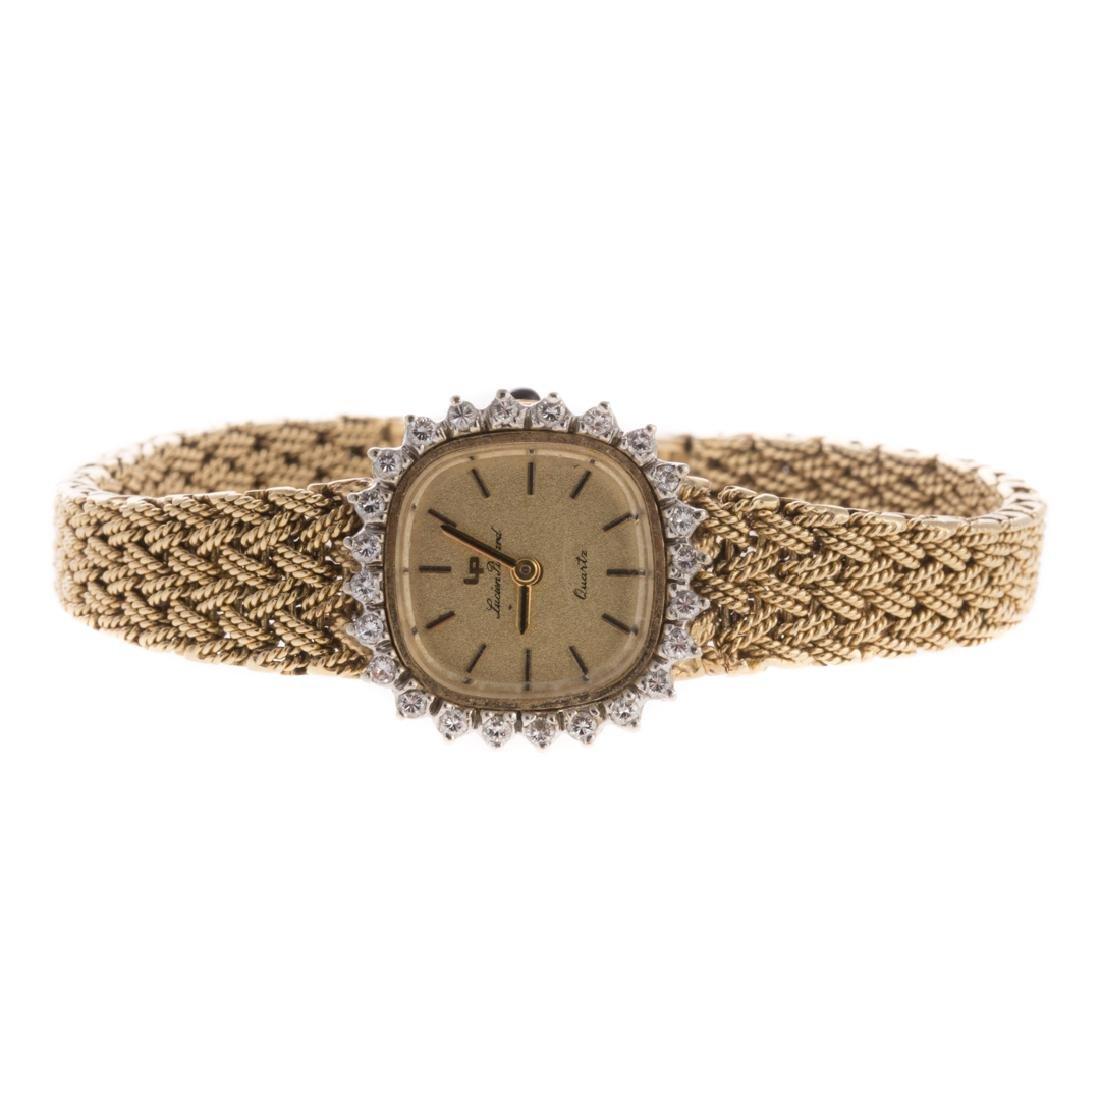 A Lady's Lucian Piccard 14K Gold & Diamond Watch